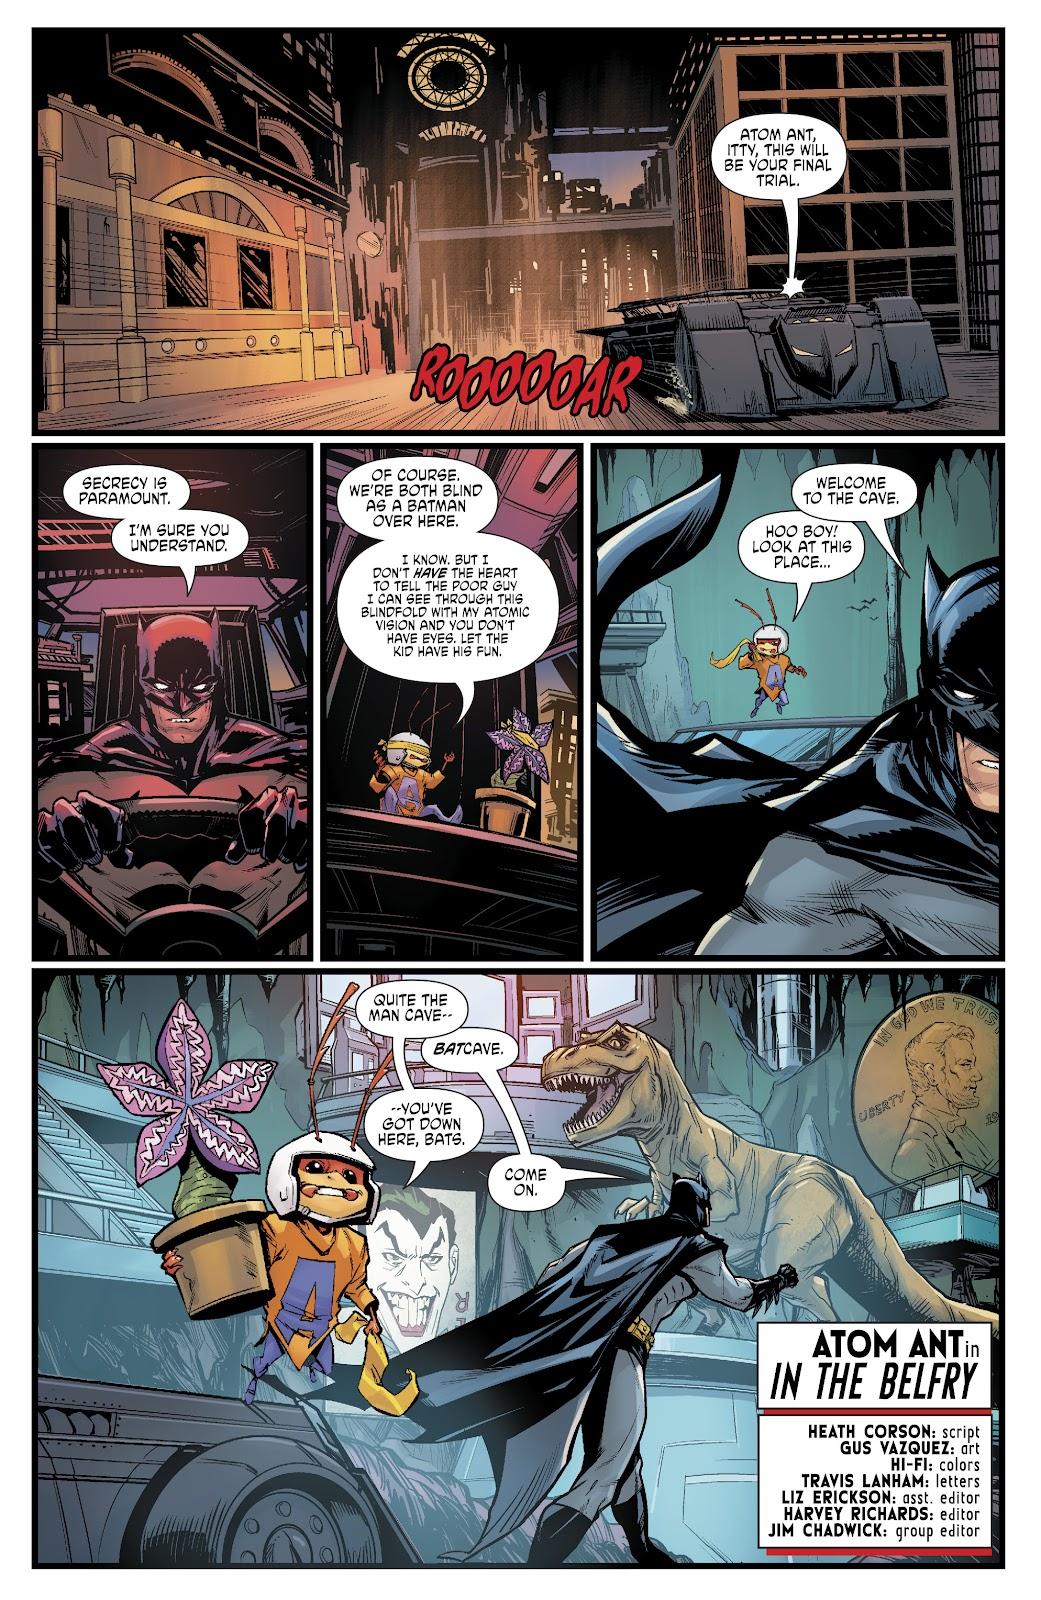 Read online Scooby Apocalypse comic -  Issue #35 - 21